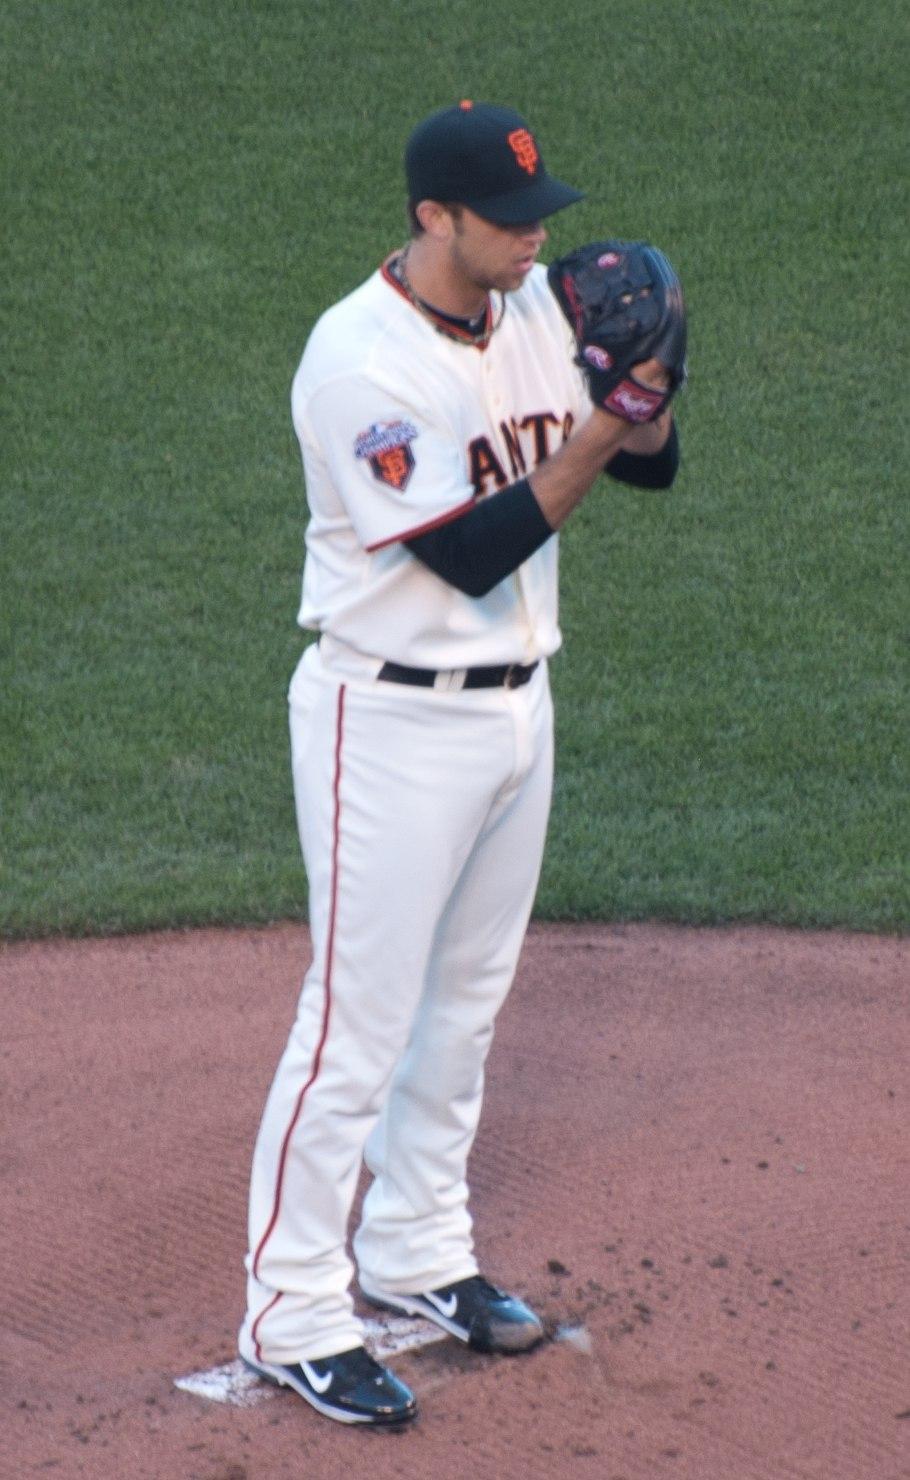 Madison Bumgarner on June 21, 2011